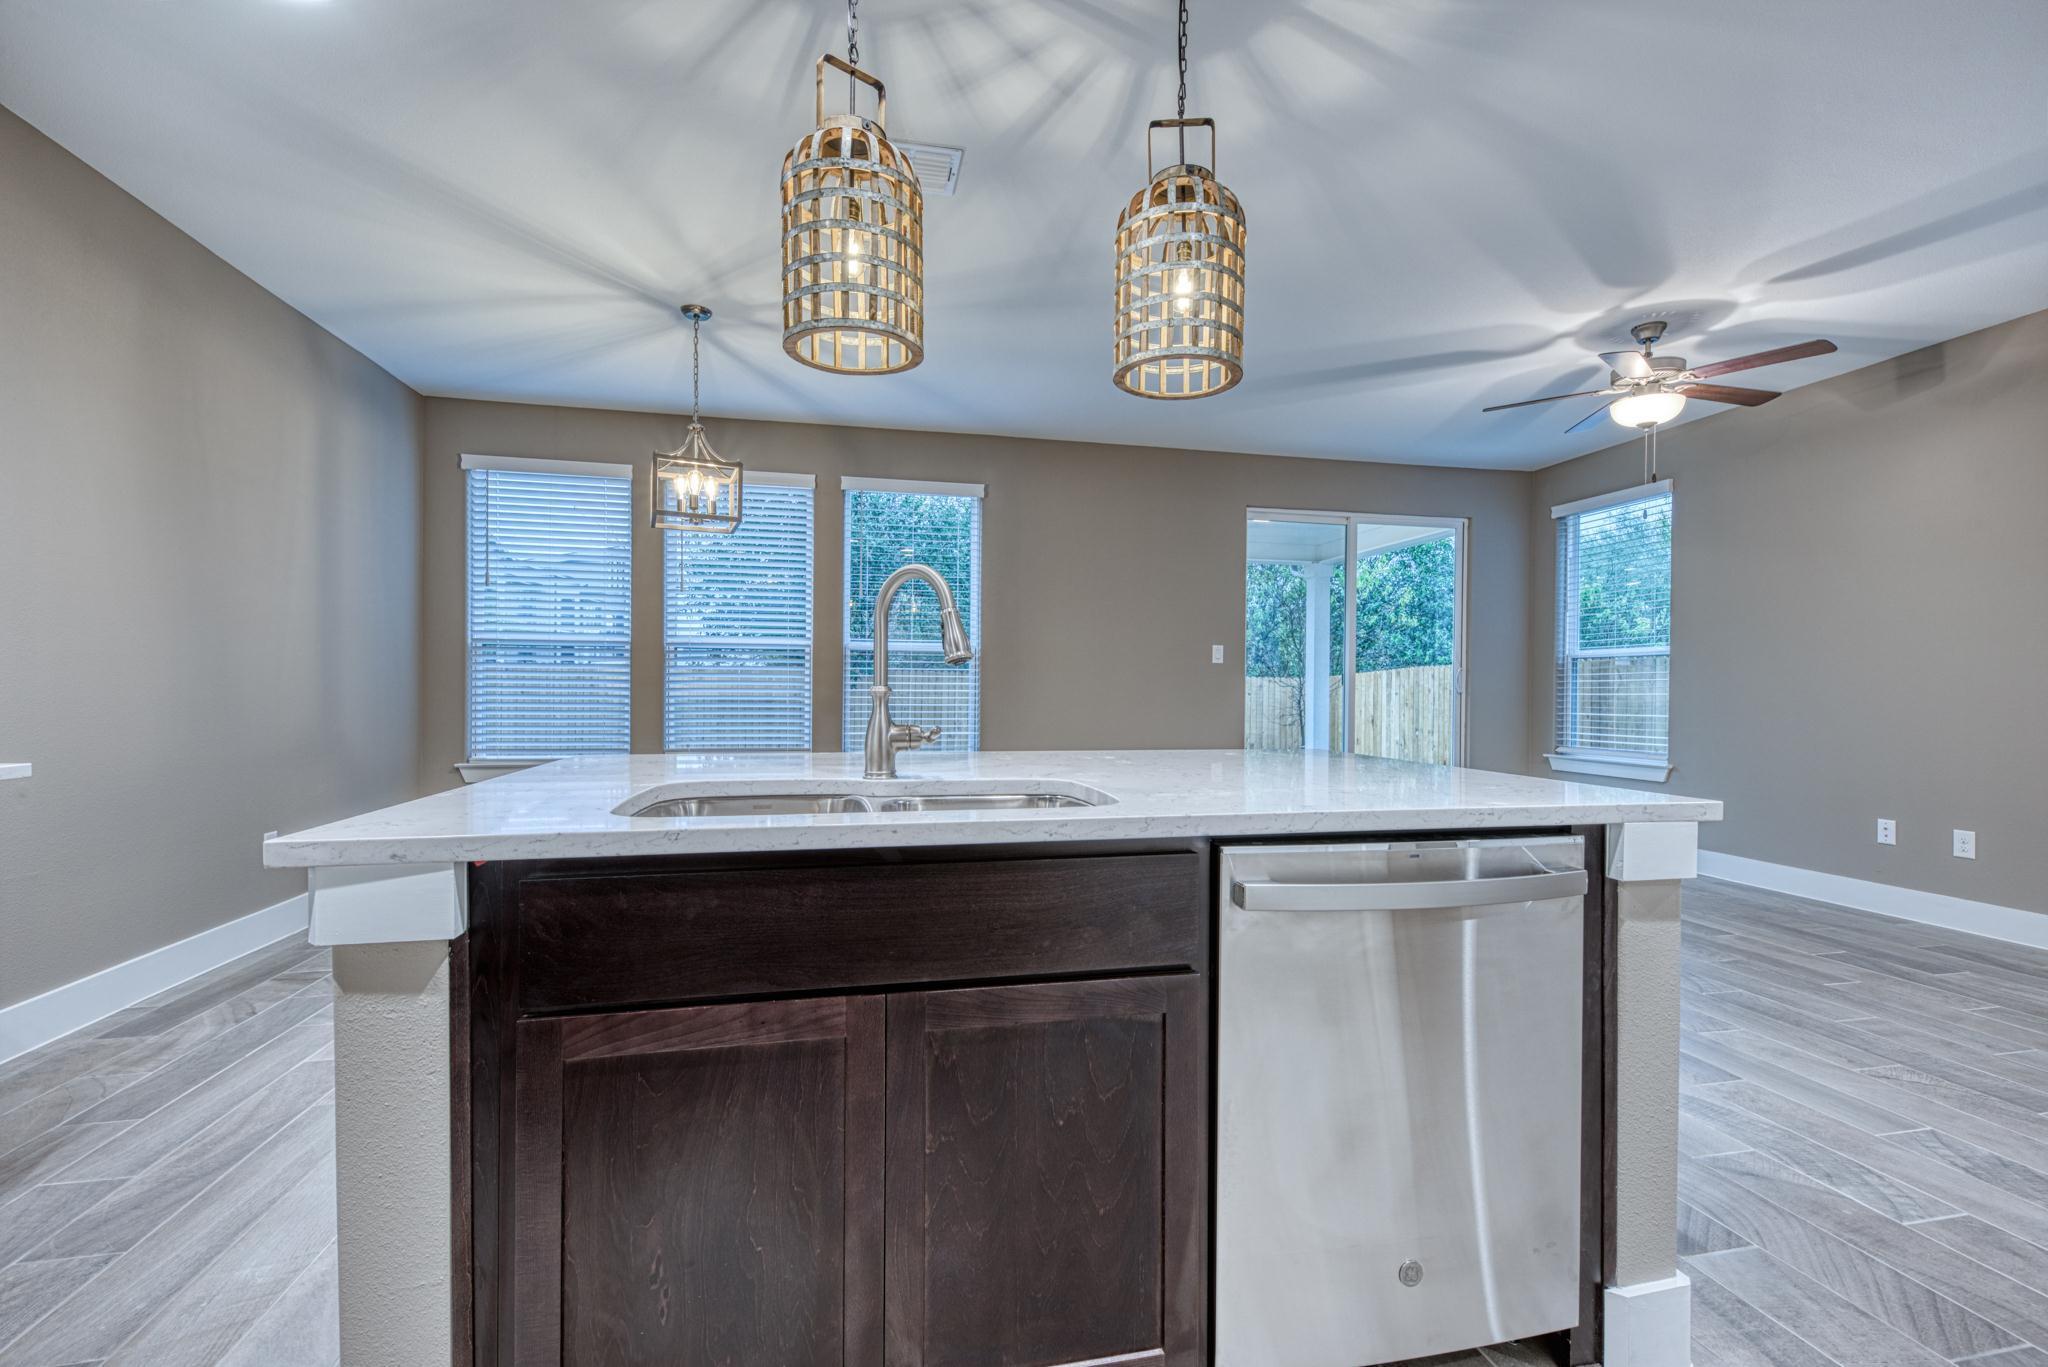 Kitchen featured in the Hamilton Creek By Casina Creek Homes, LLC in San Antonio, TX